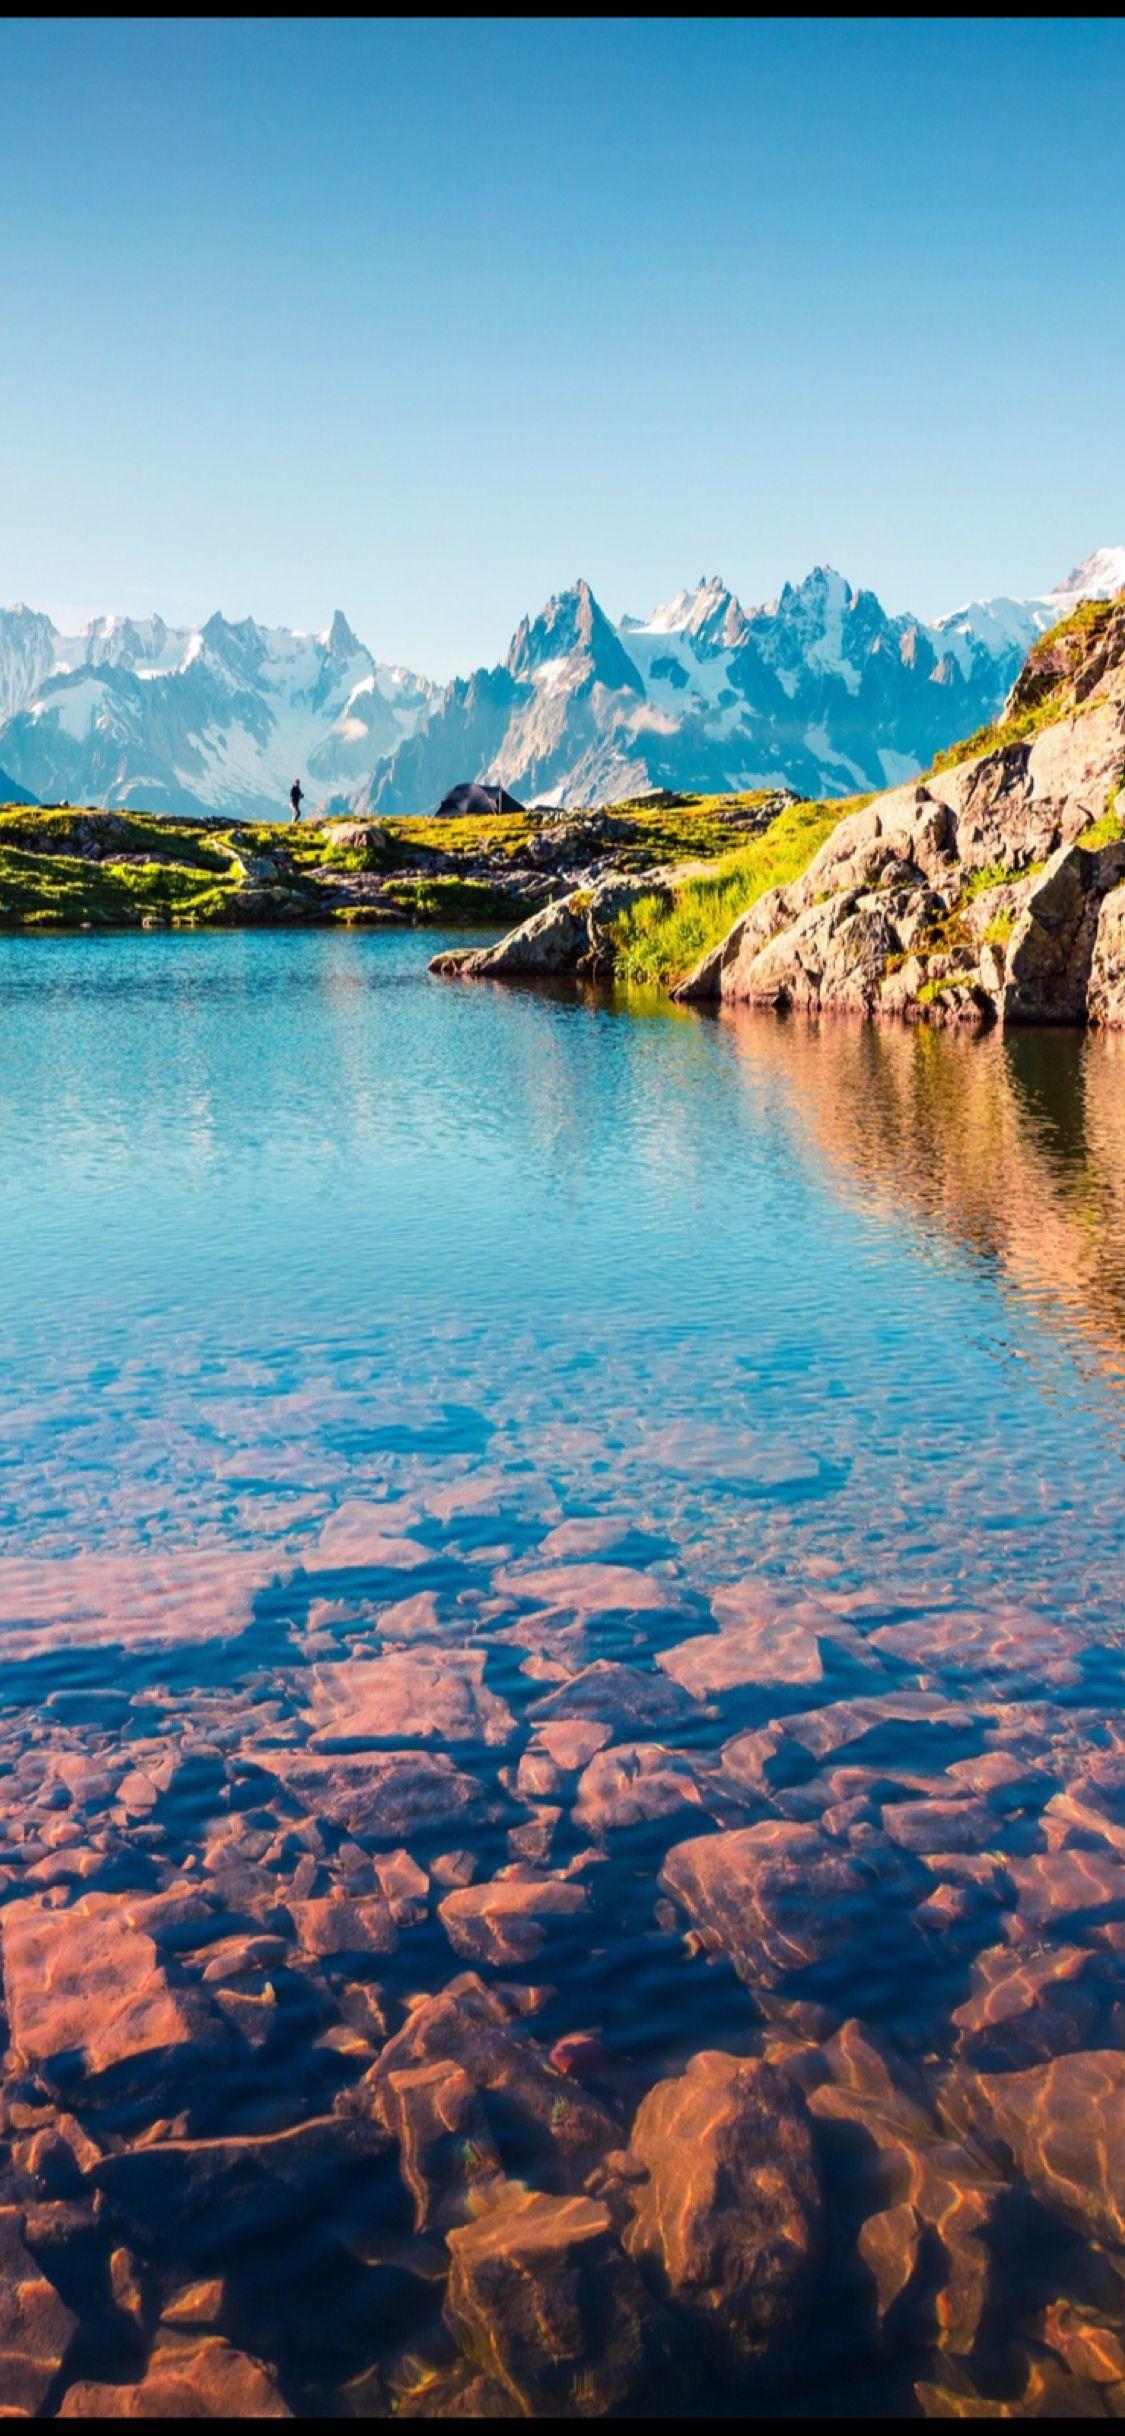 The Mountainous Lake Of Peace Nature Wallpaper Summer Wallpaper Summer Lake